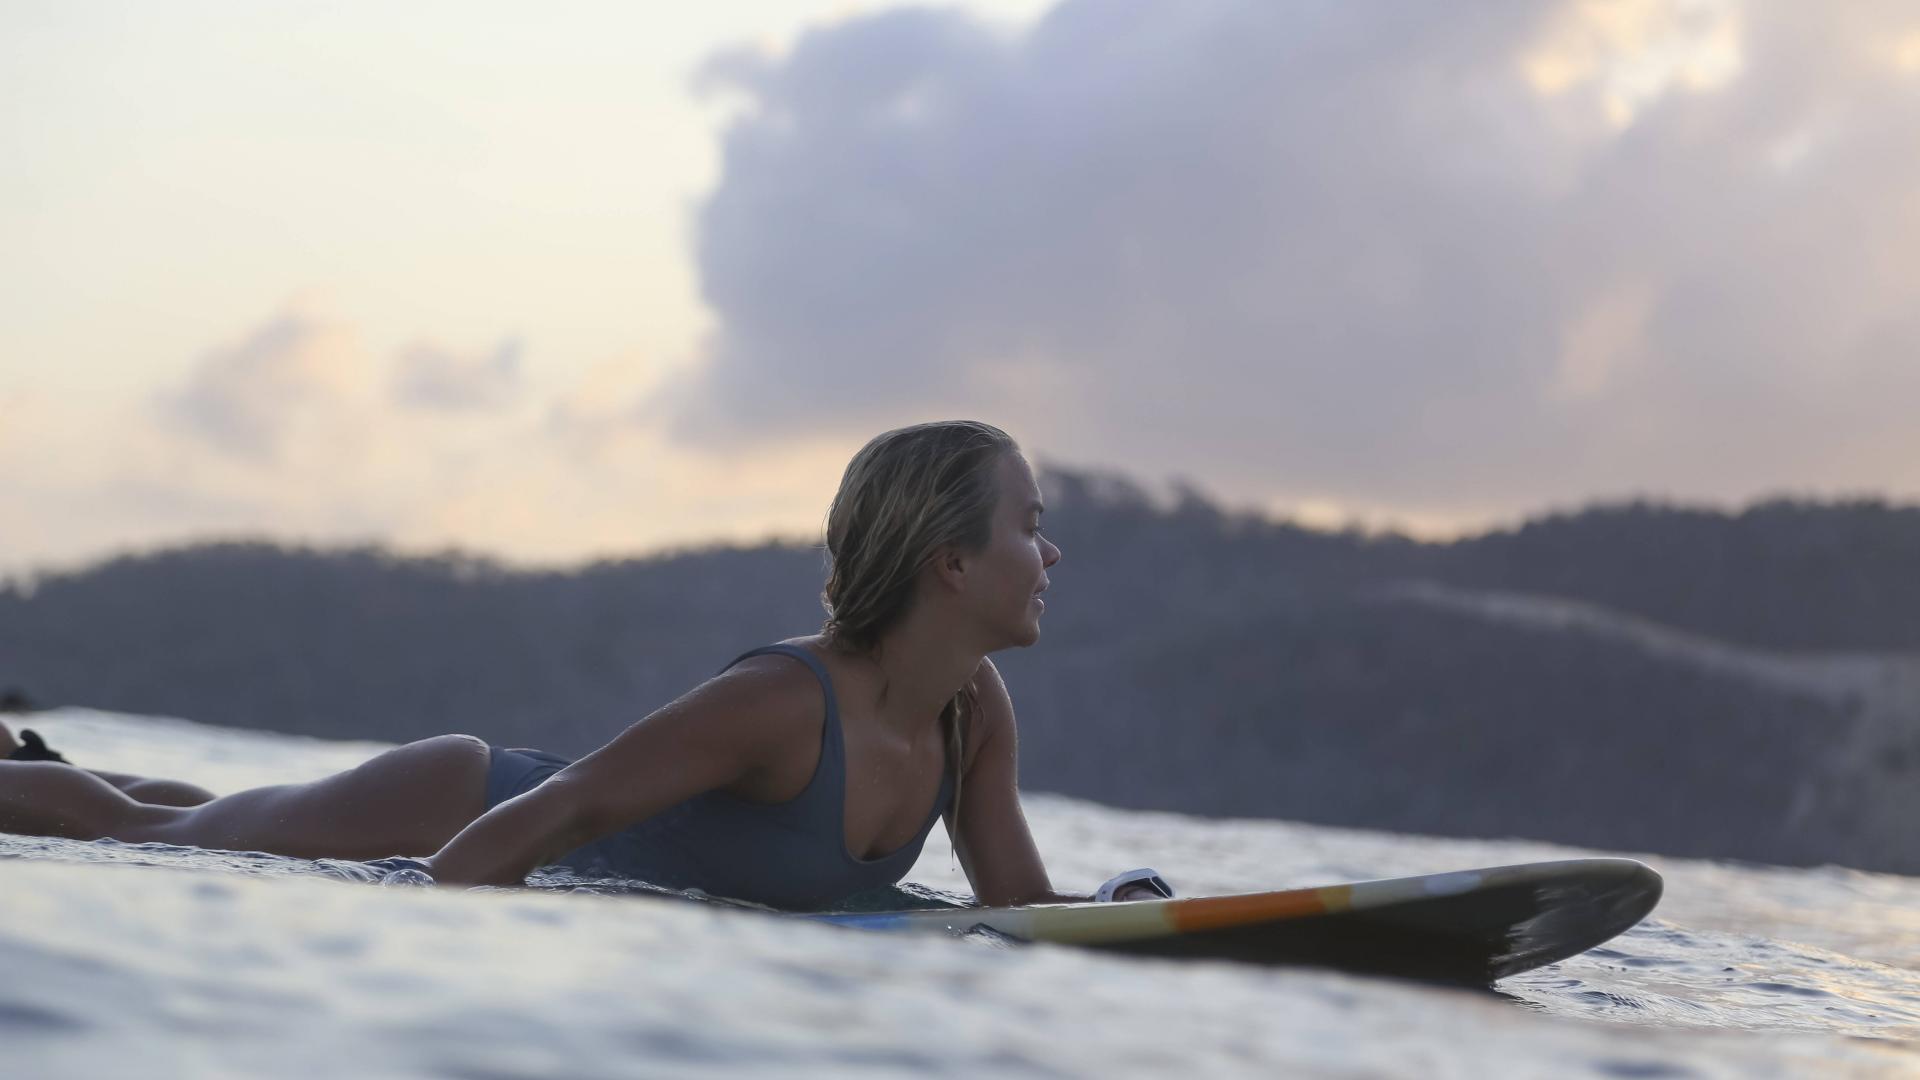 Surfer, Frau, Lombok, Meer, Wasser